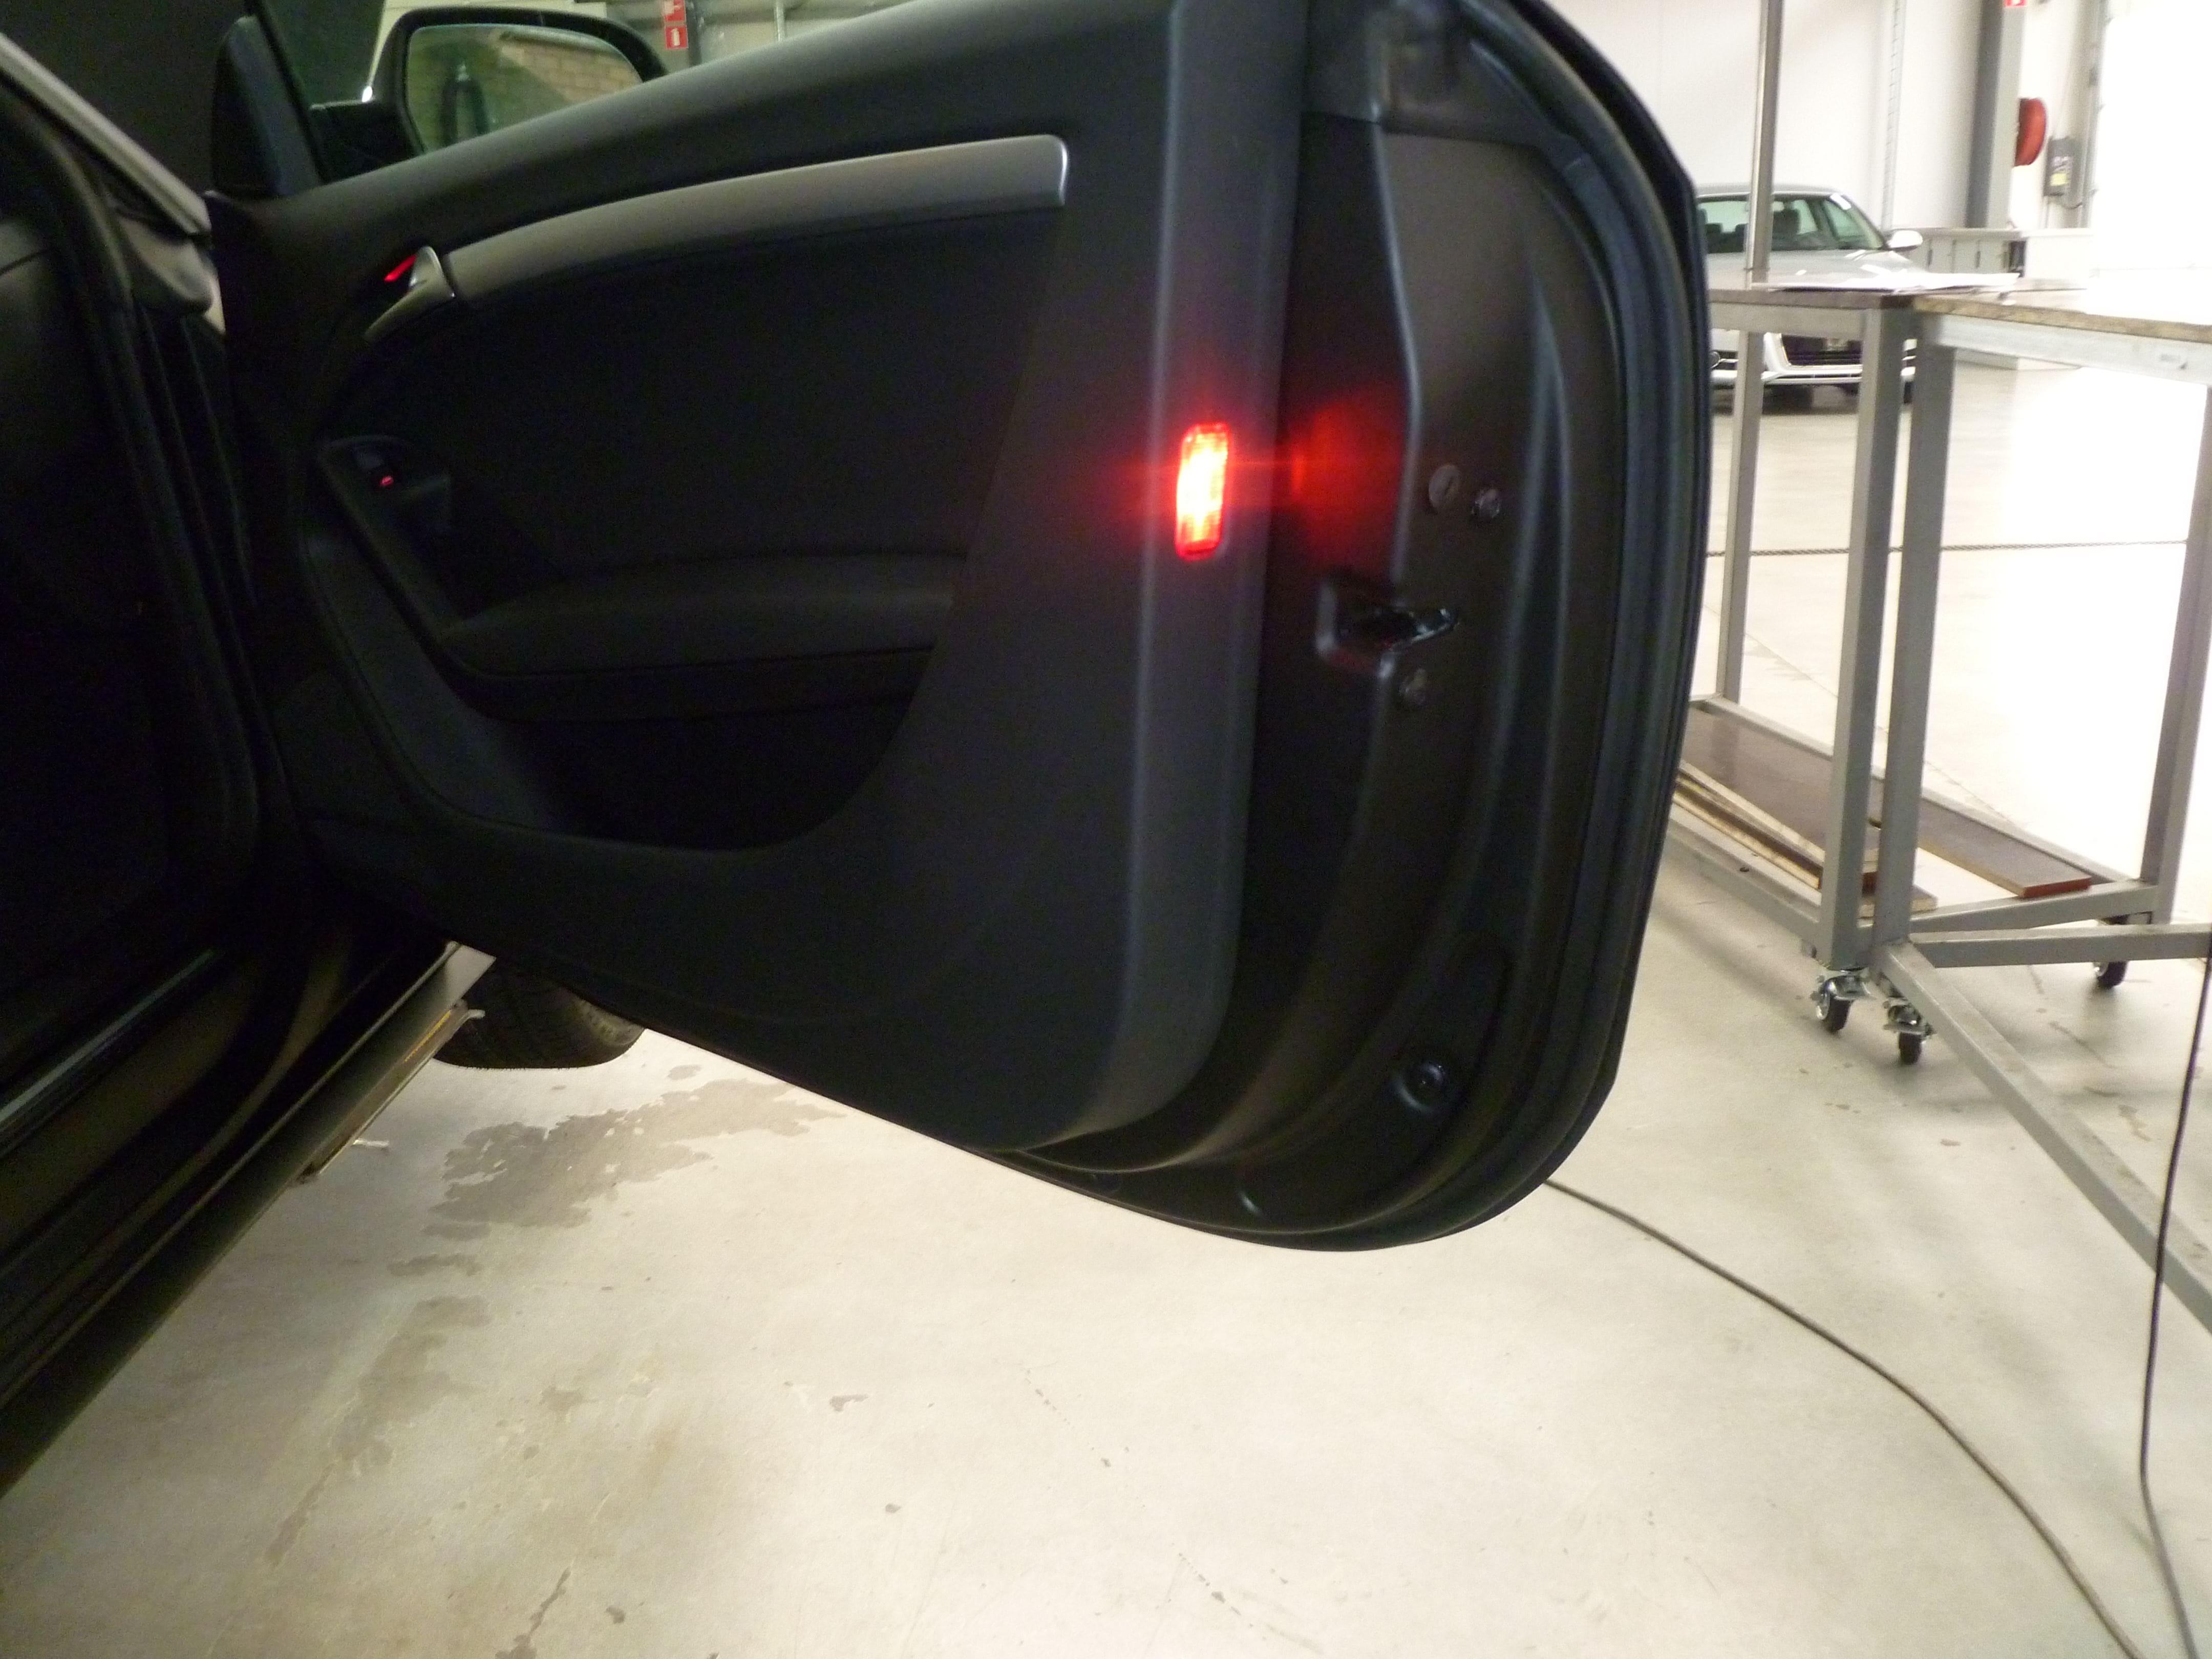 Audi A5 Coupe met Mat Zwarte Wrap, Carwrapping door Wrapmyride.nu Foto-nr:4653, ©2021